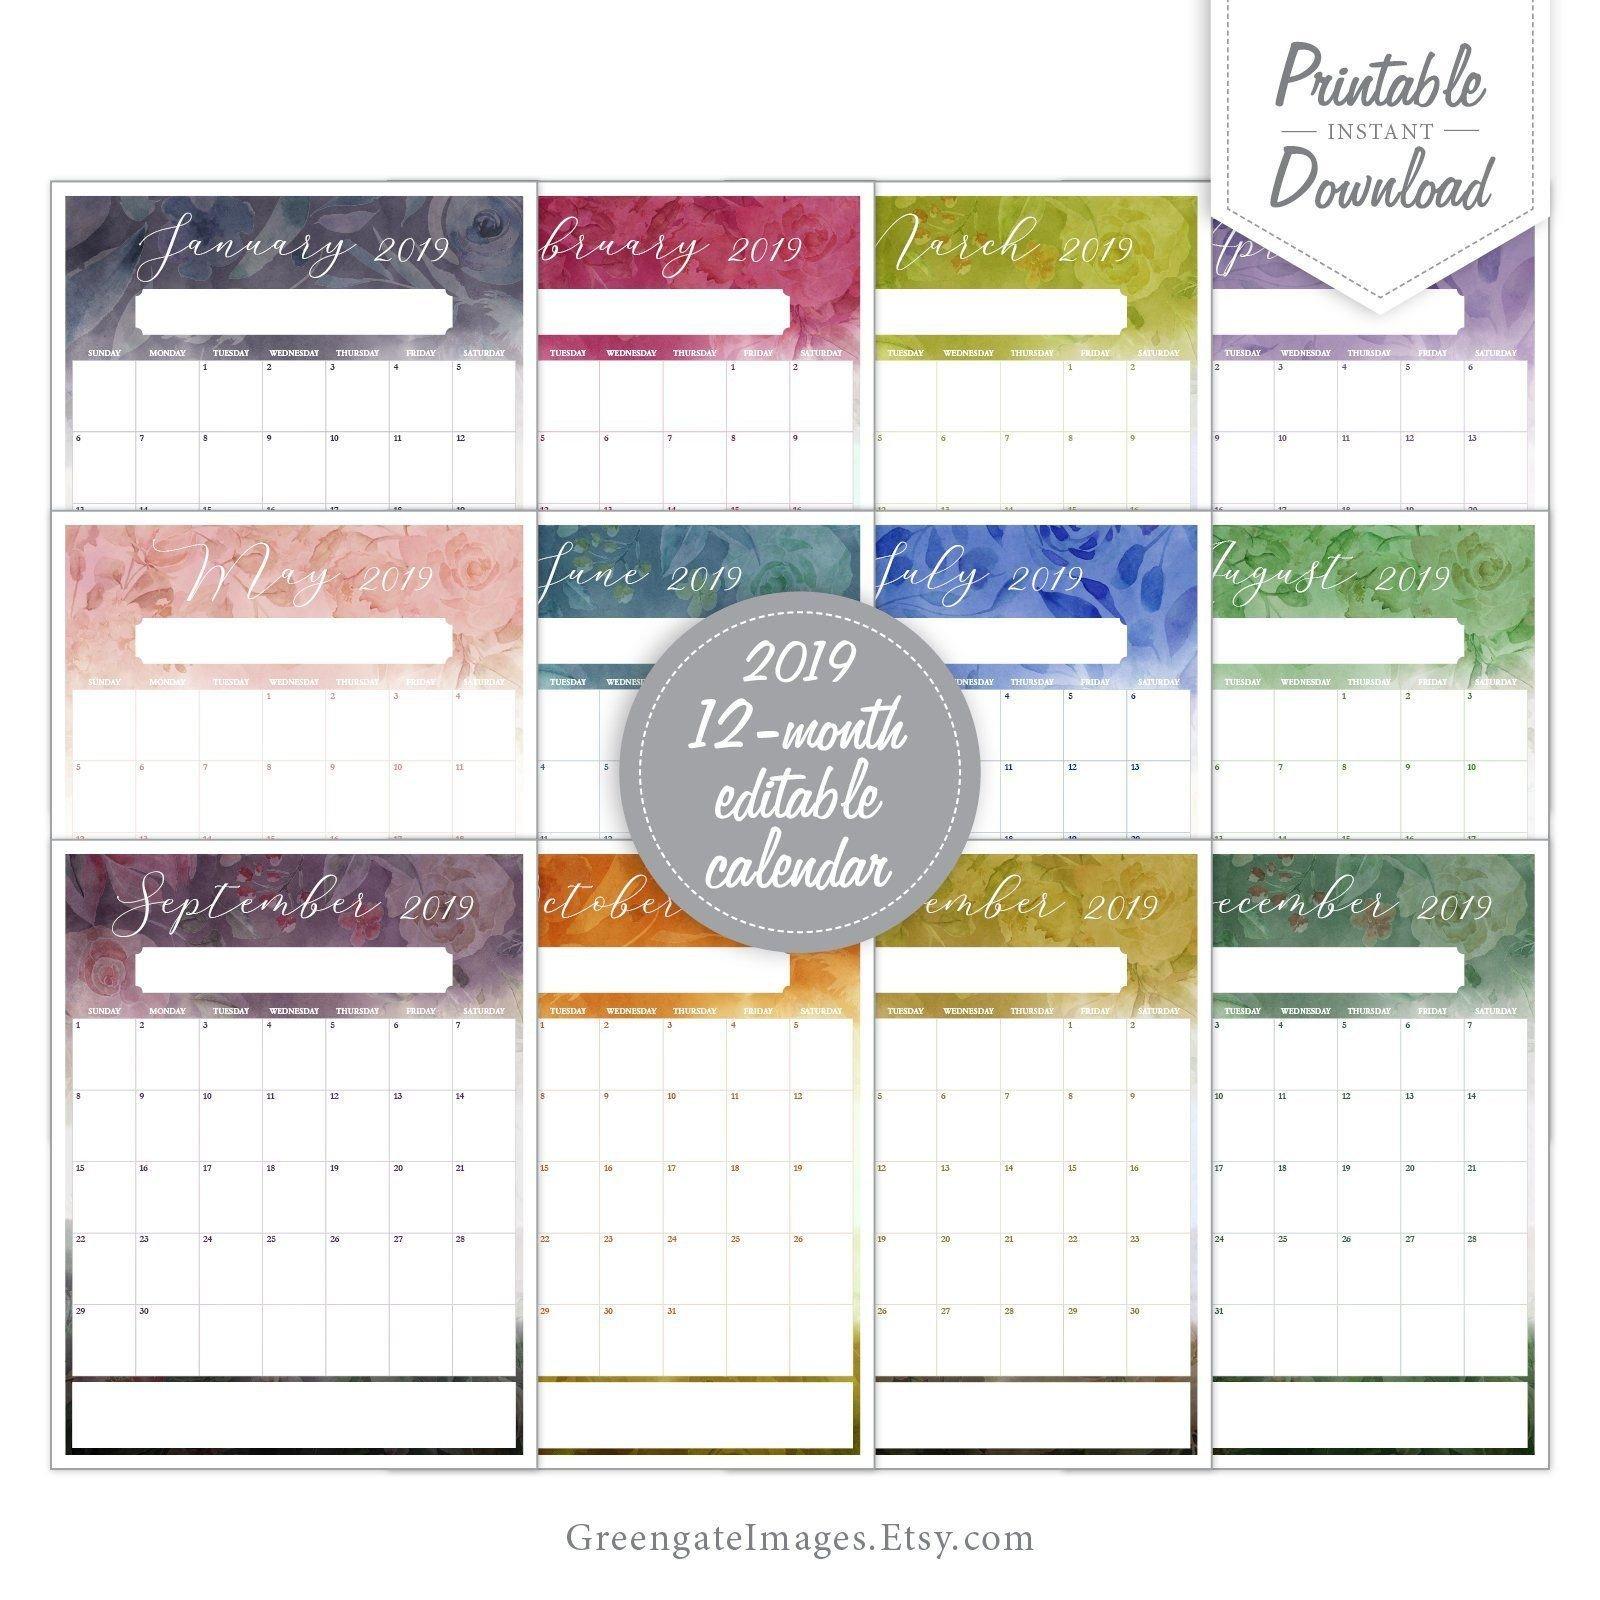 2019 Editable Calendar – Fillable Calendar, 12 Month 12 Month Editable Calendar